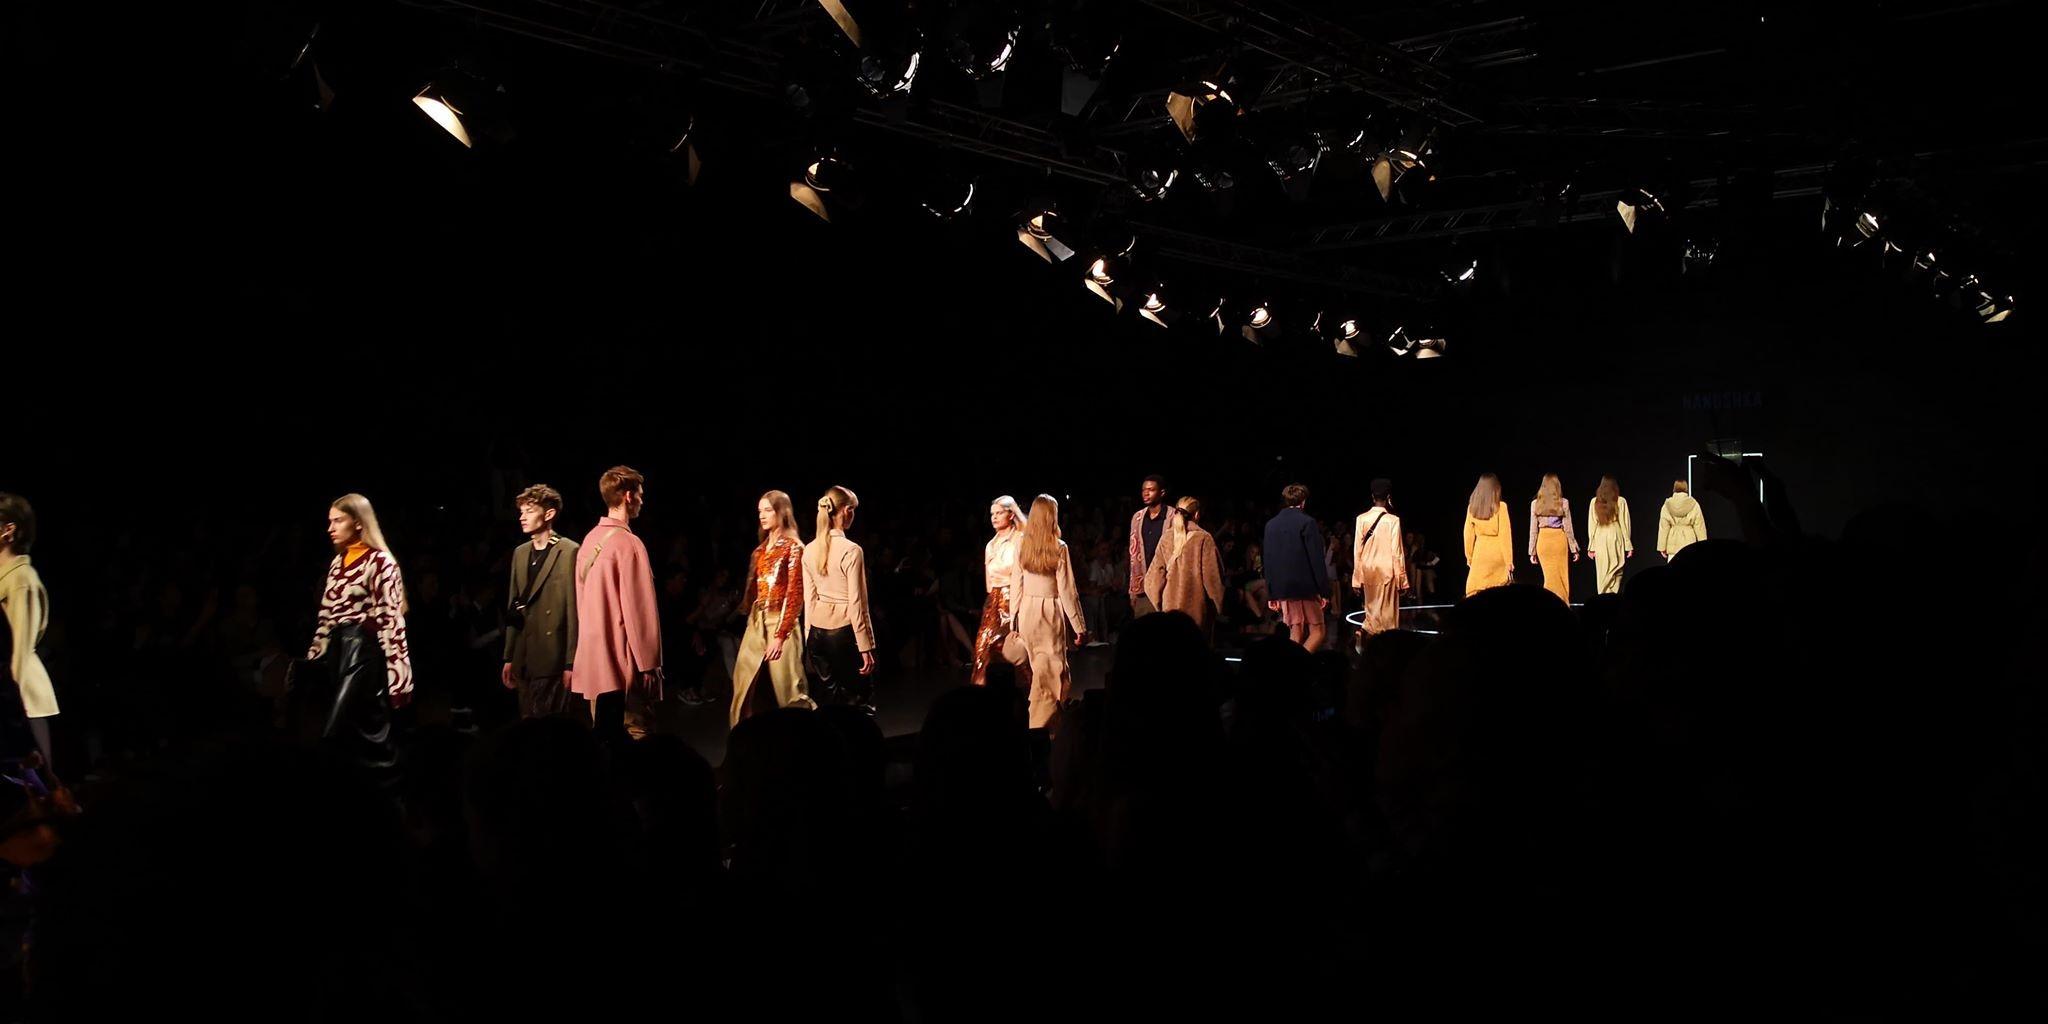 eskuvo-classic-budapest-central-european-fashion-week-blog-7.jpg